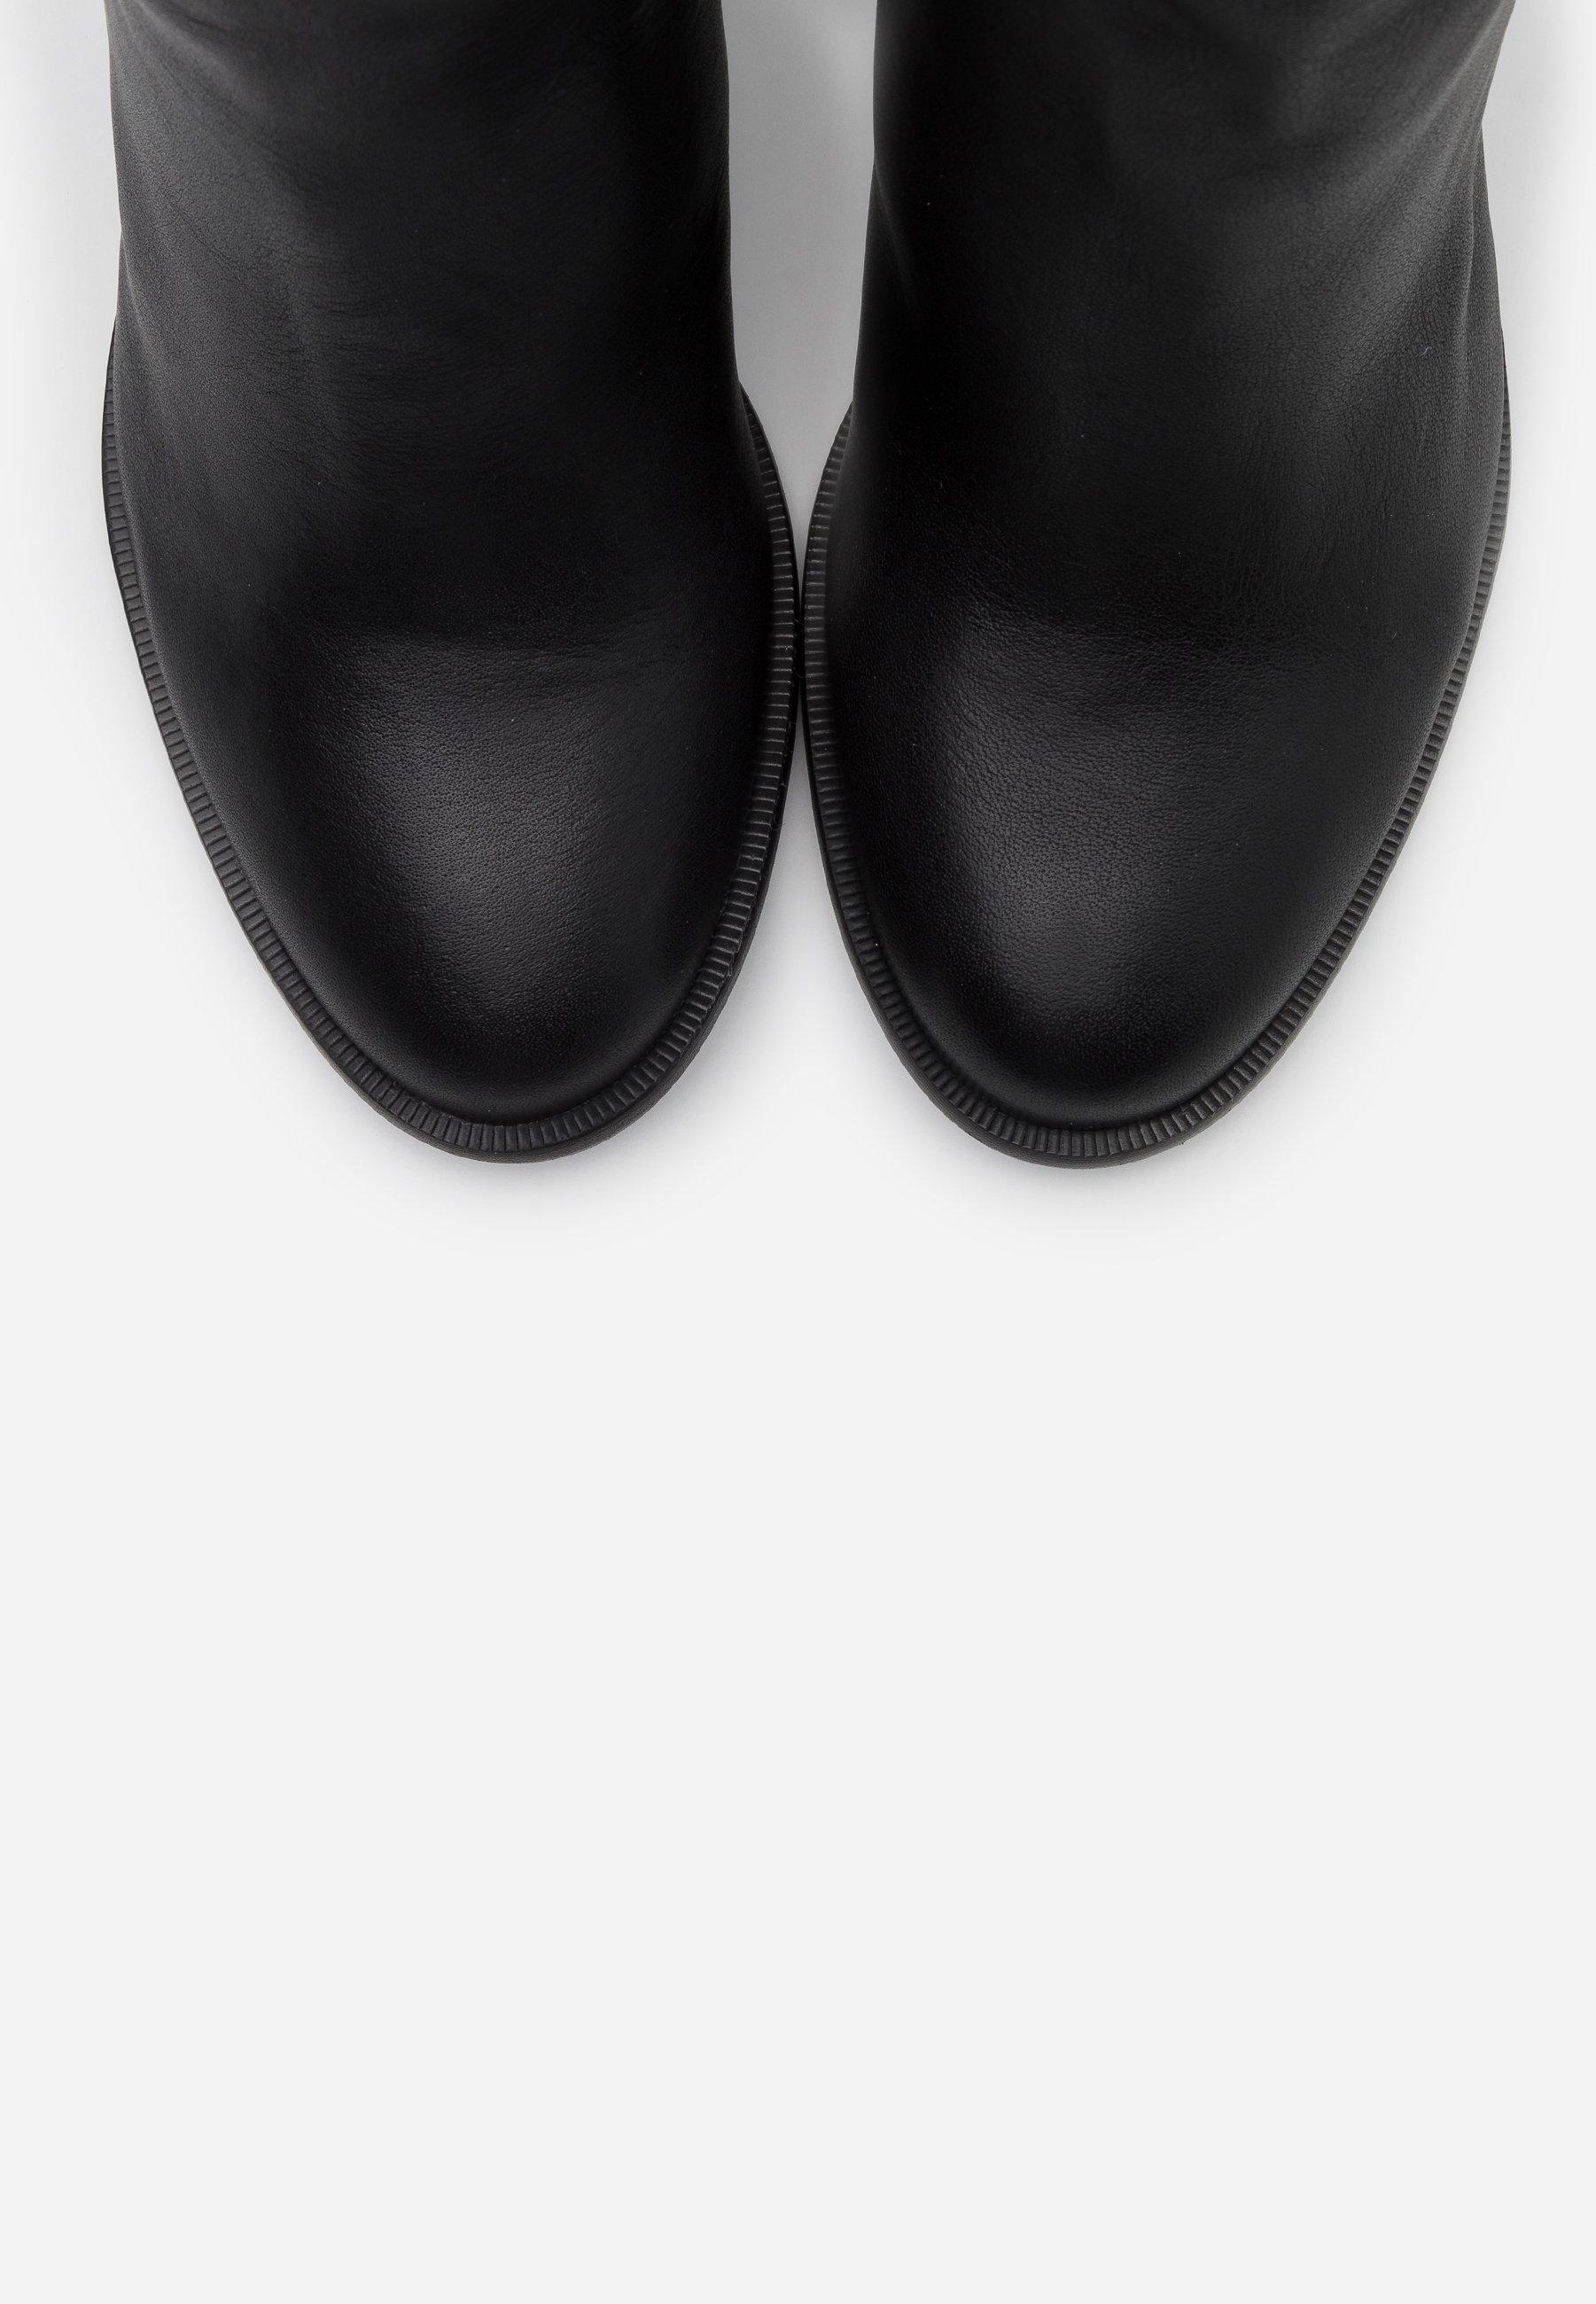 Zign Stiefel - Black/schwarz